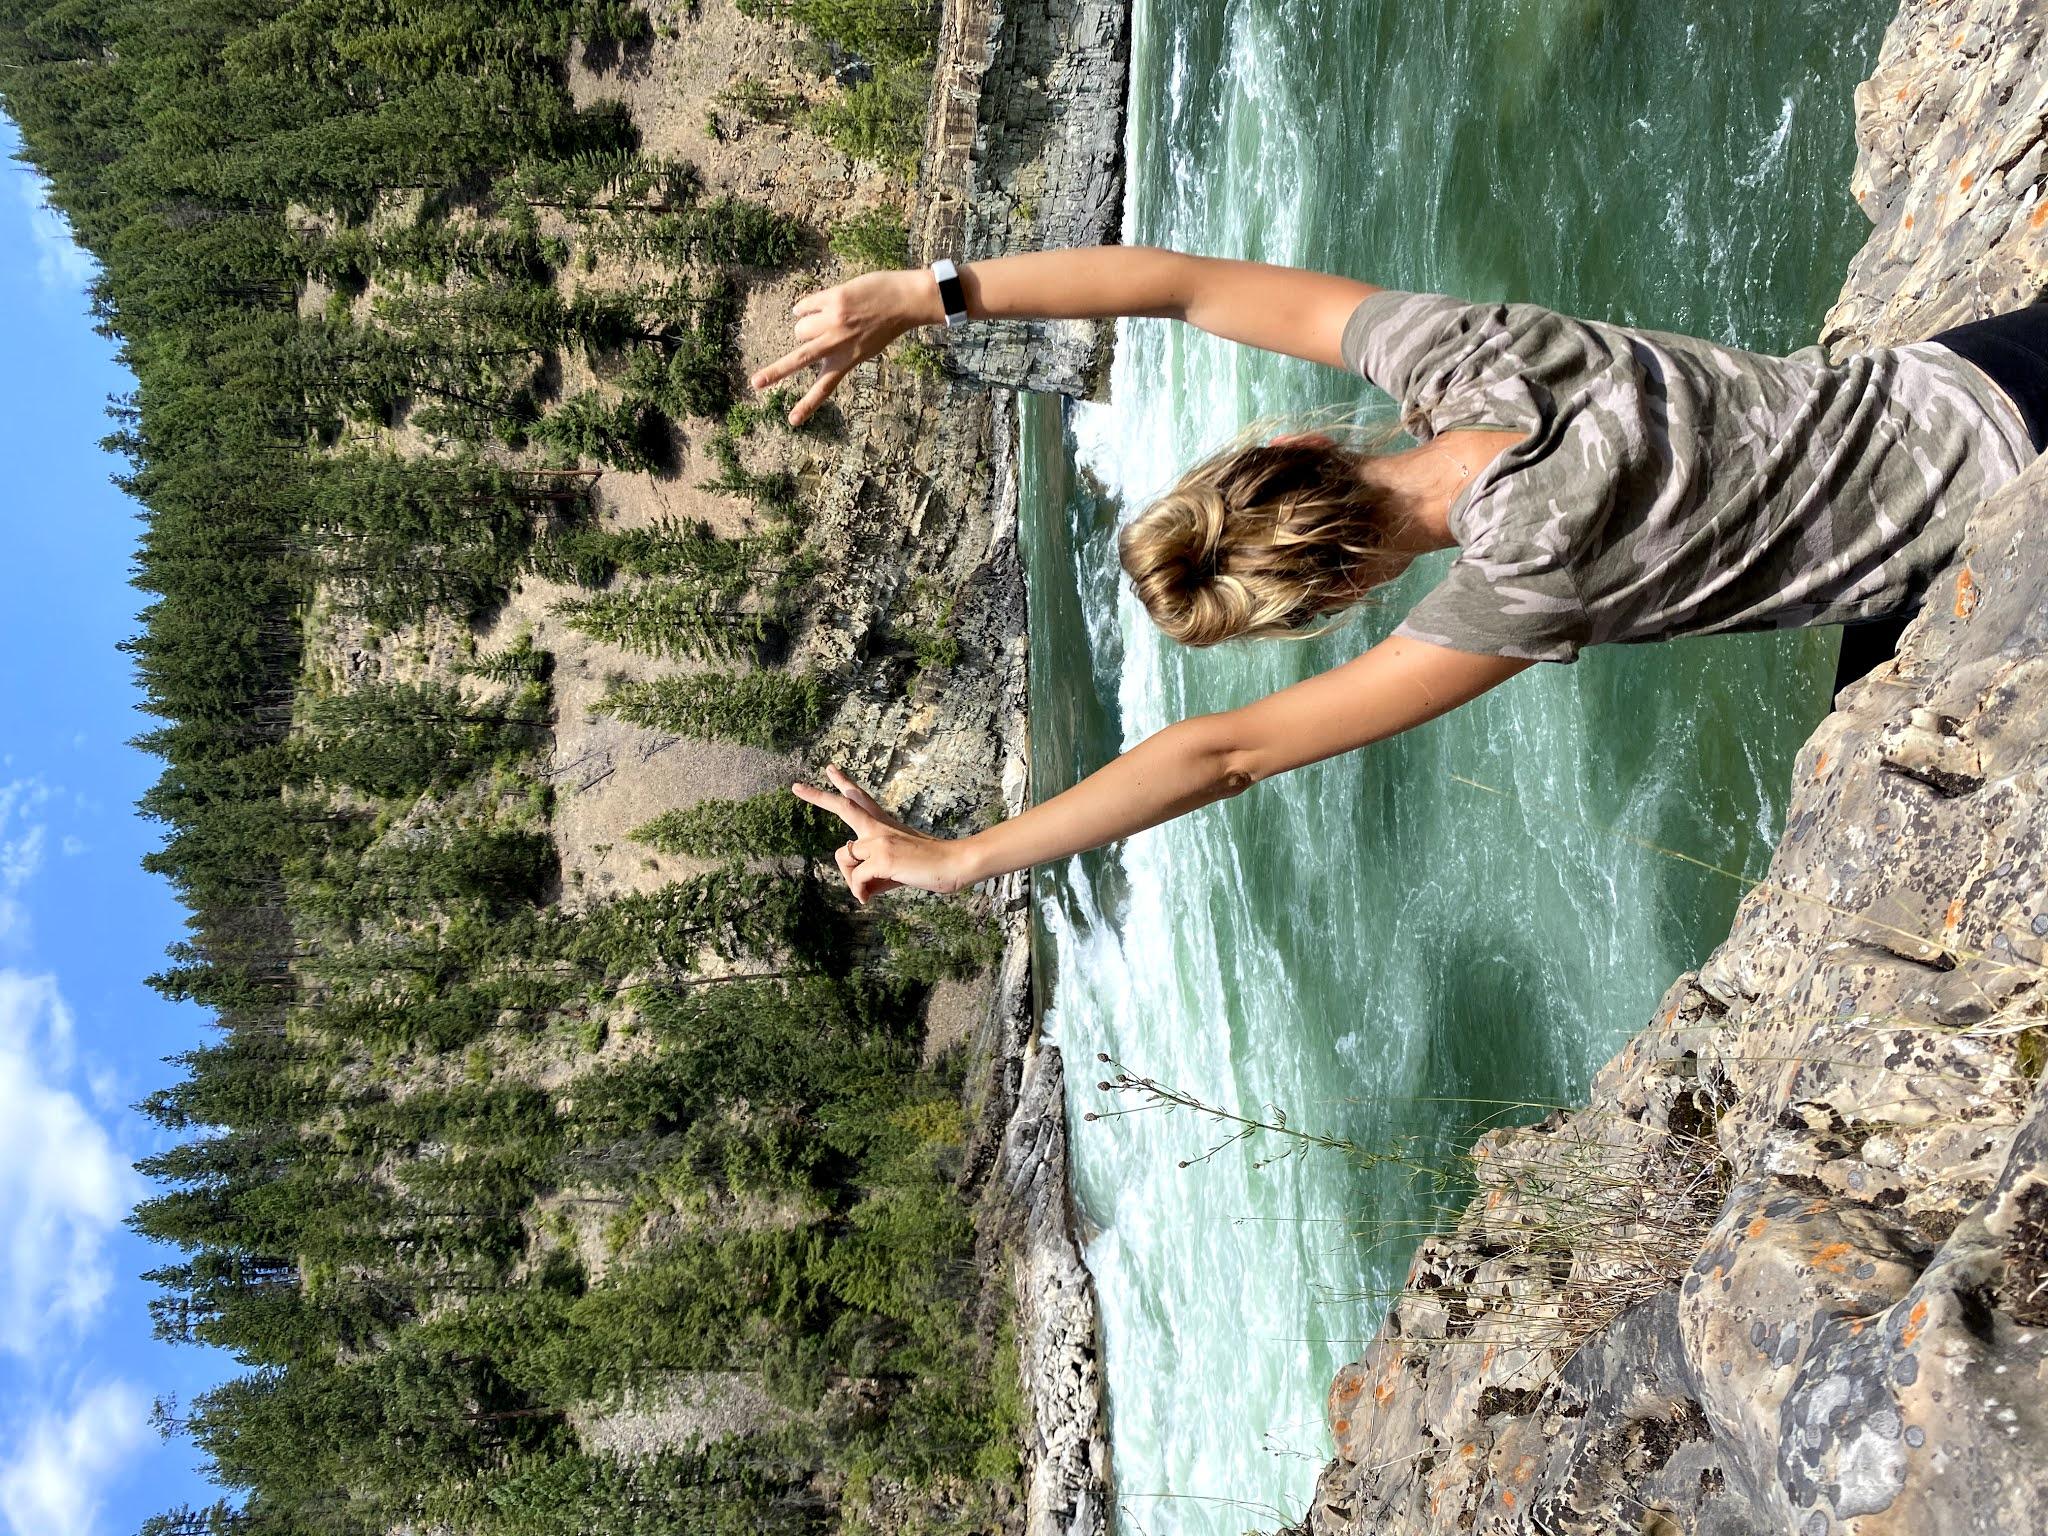 Kootenai Falls, Montana | biblio-style.com